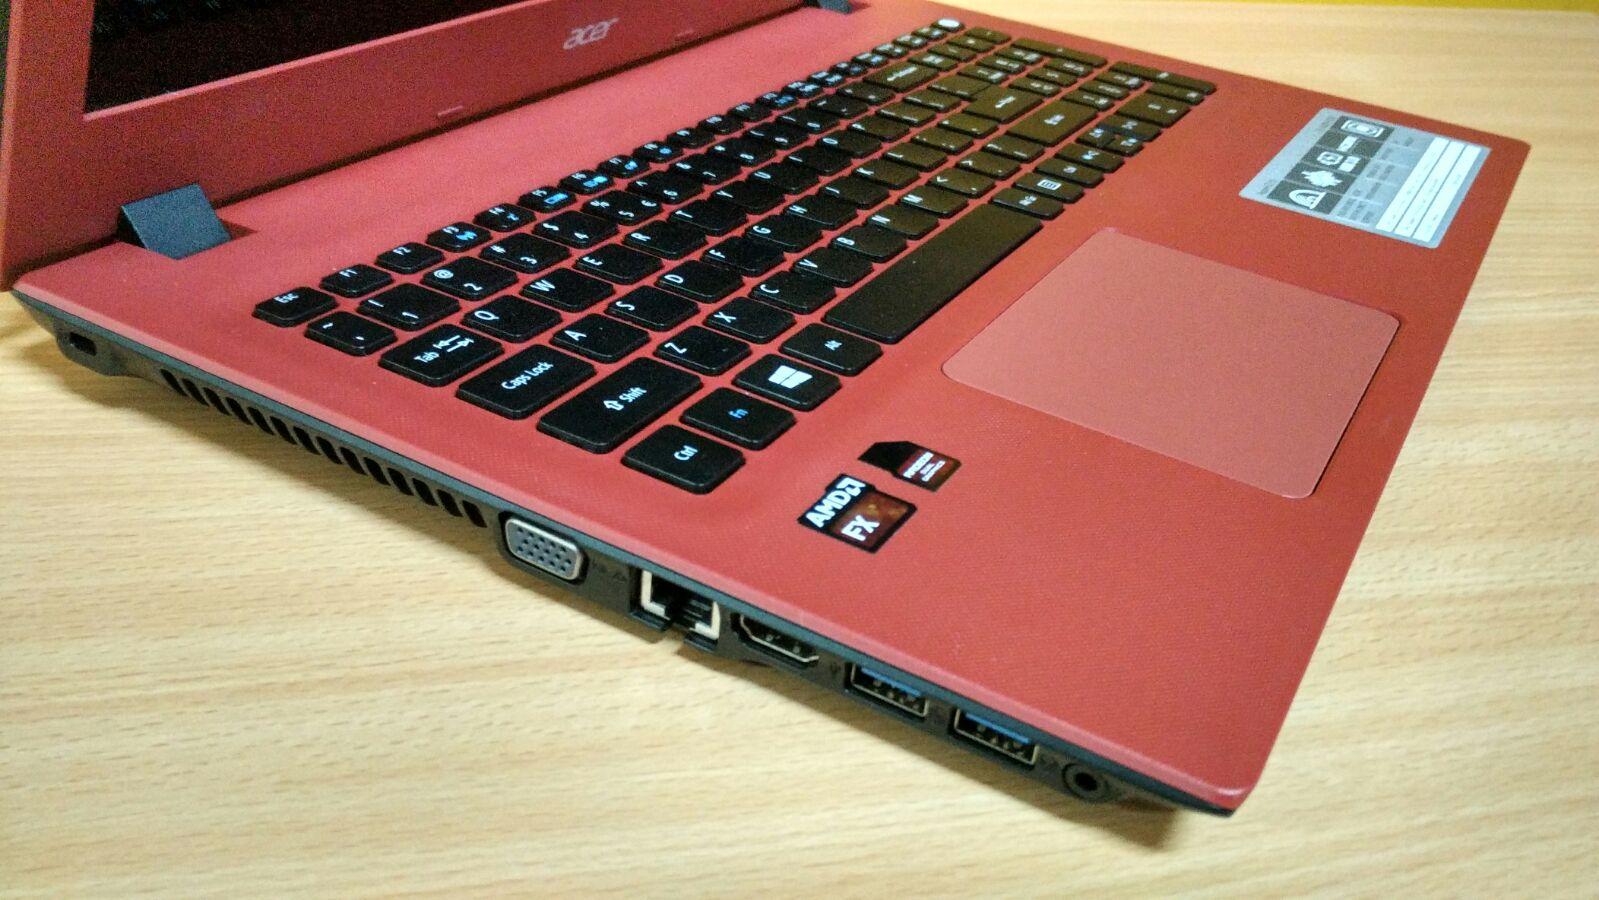 Port dan rapi dan Desain Keyboard yang pas membuat Aspire E5-552G (FX) sangat istimewa